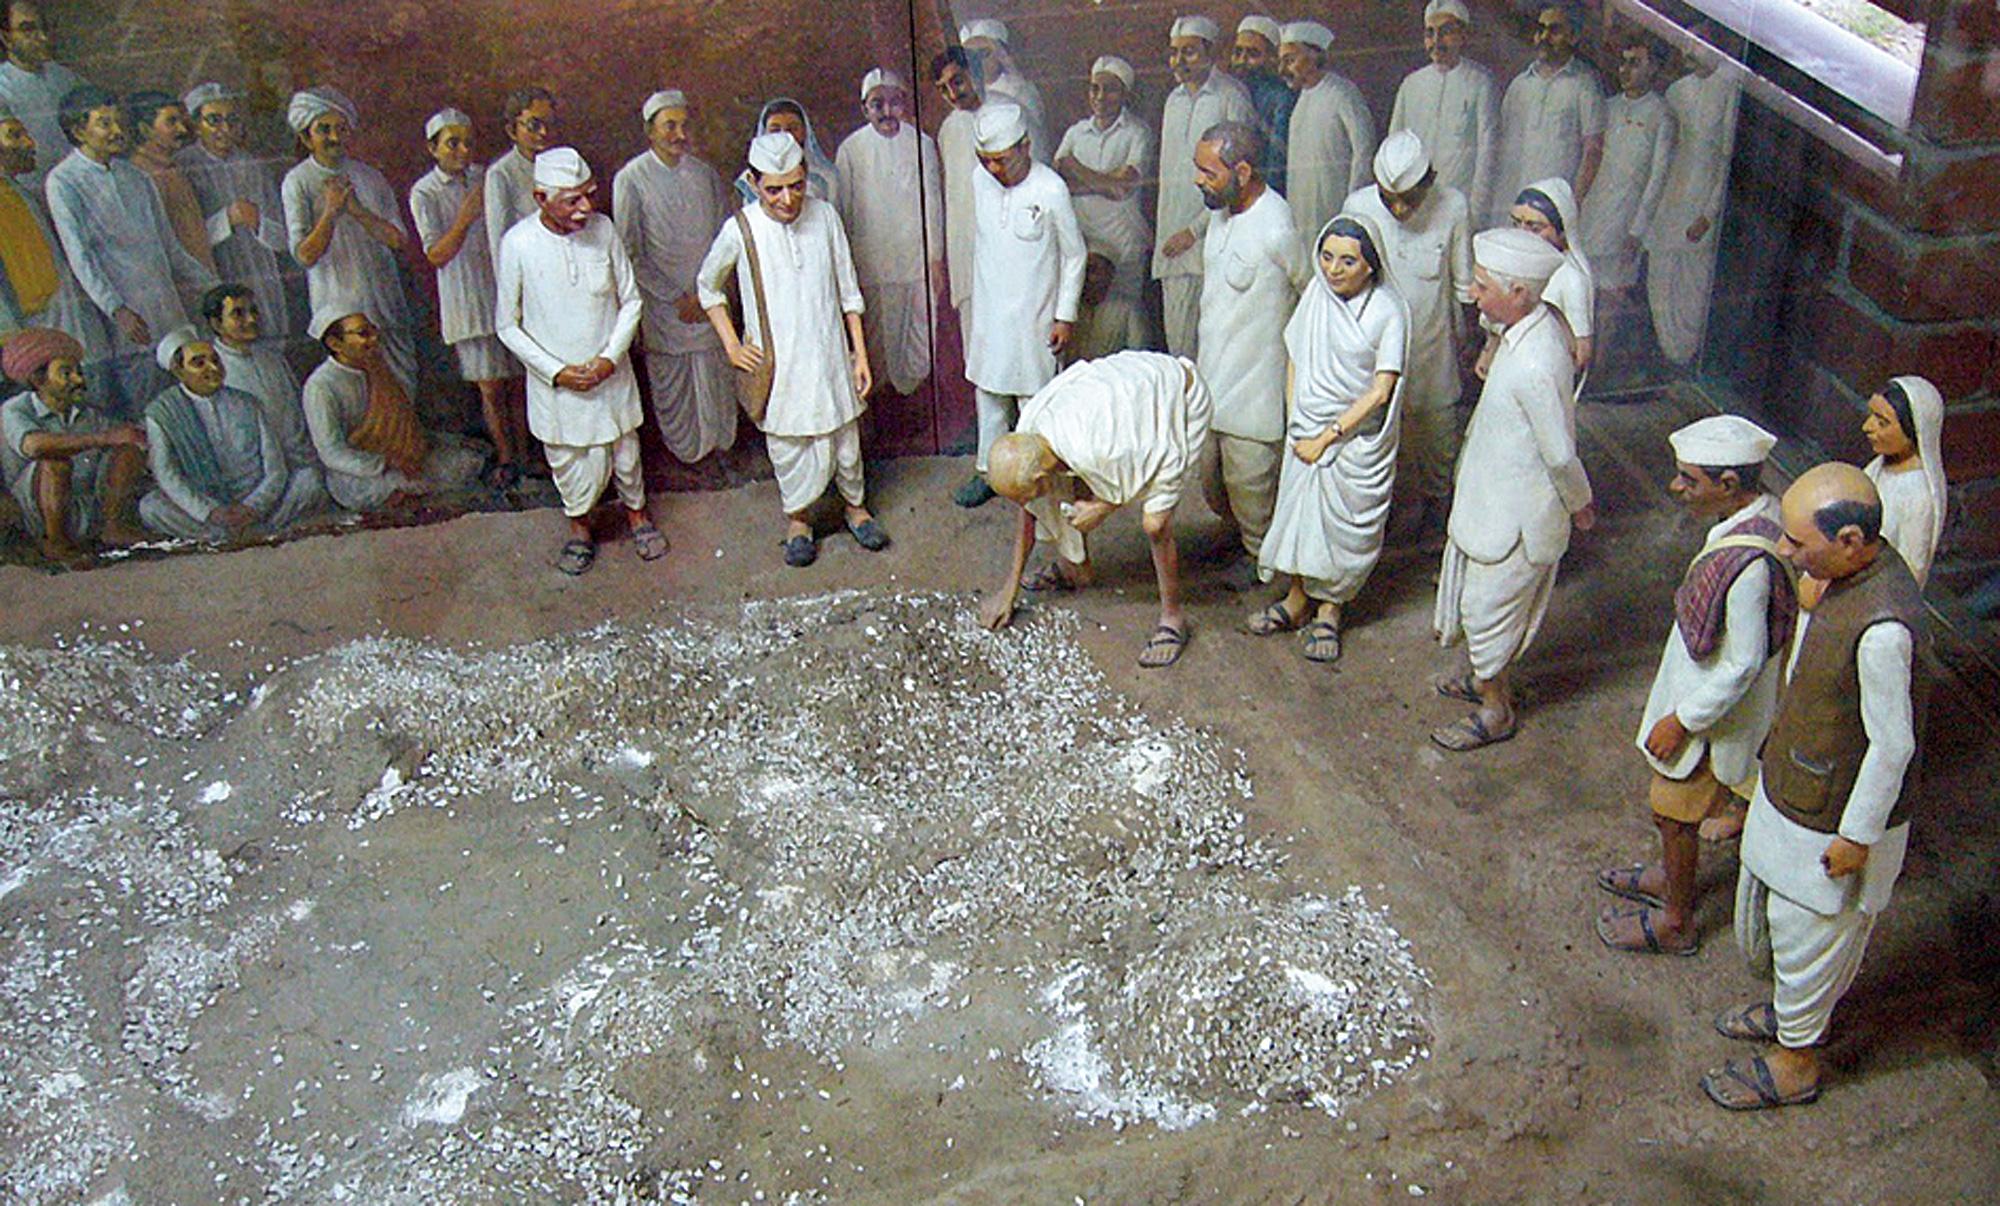 An exhibit on Gandhi picking salt after the Dandi March